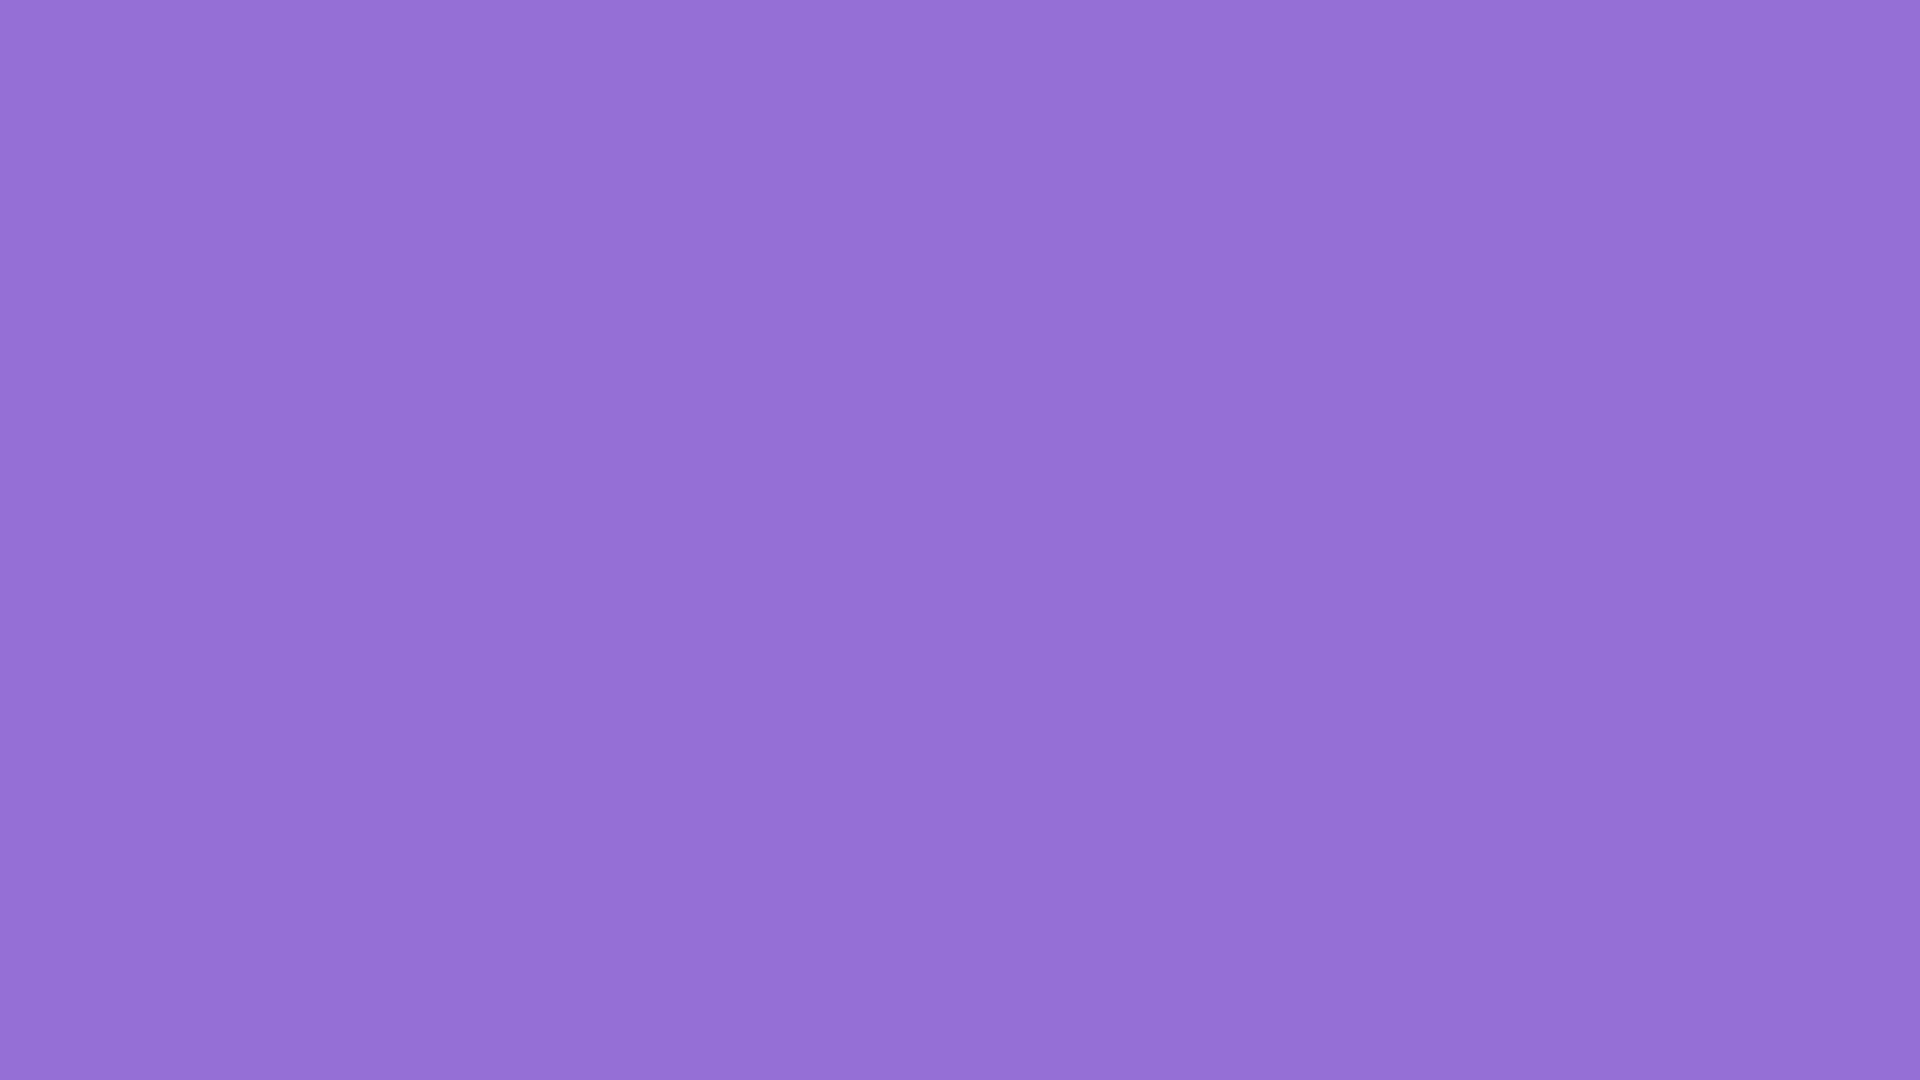 Dark Solid Purple Wallpaper 65 Images